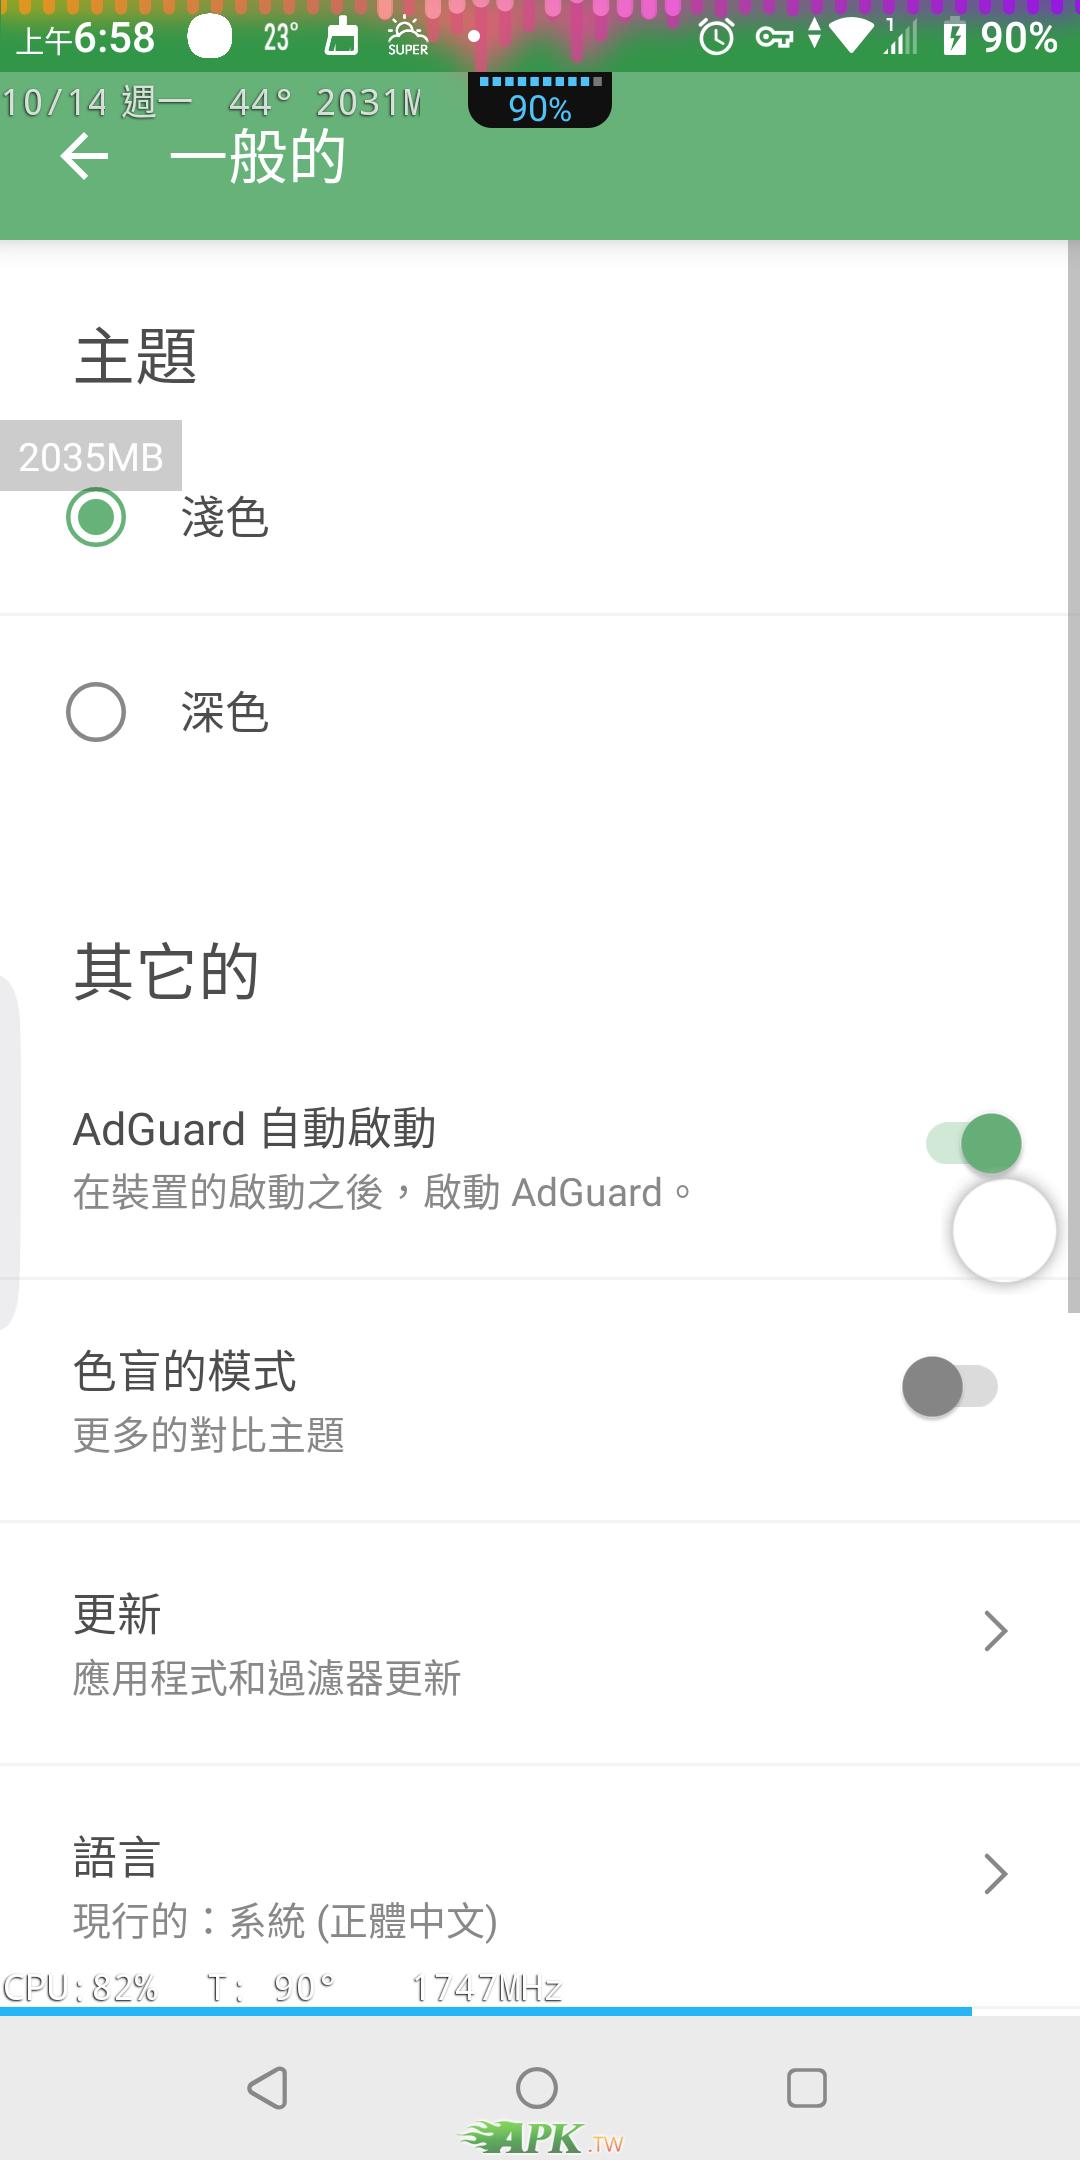 Screenshot_20191014-065824.png